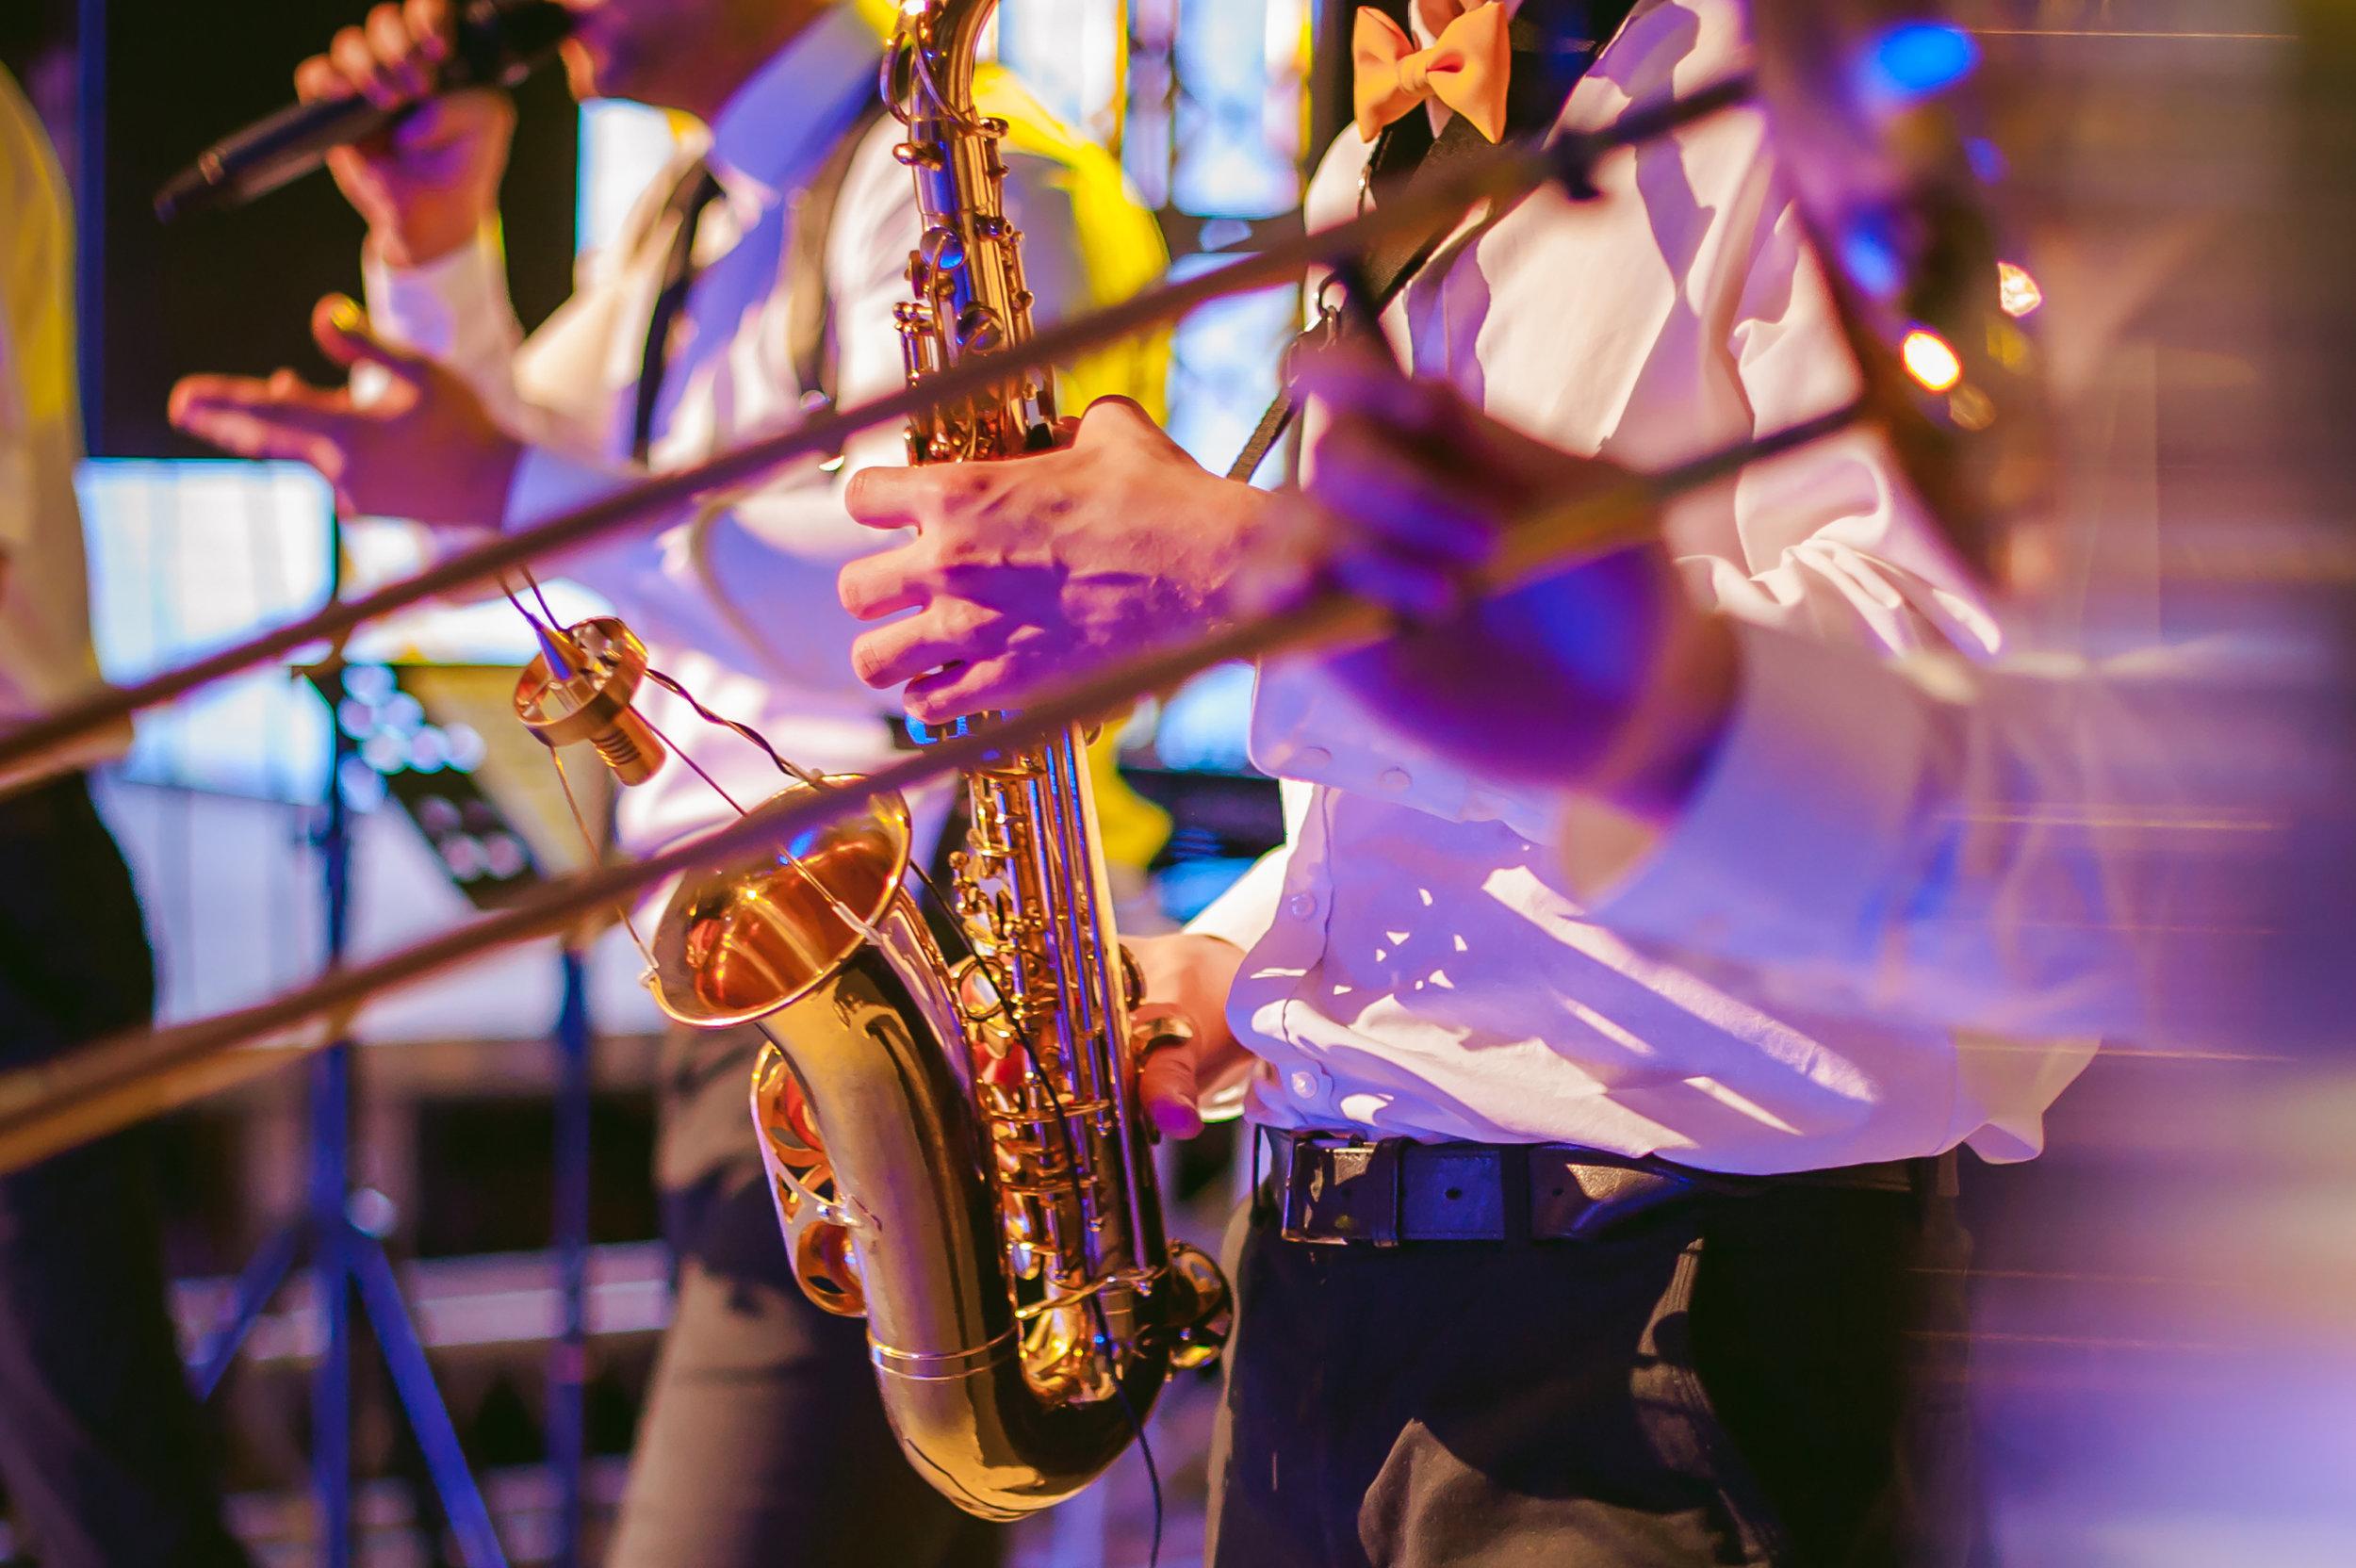 Jazz band, saxophone, trombone, singer